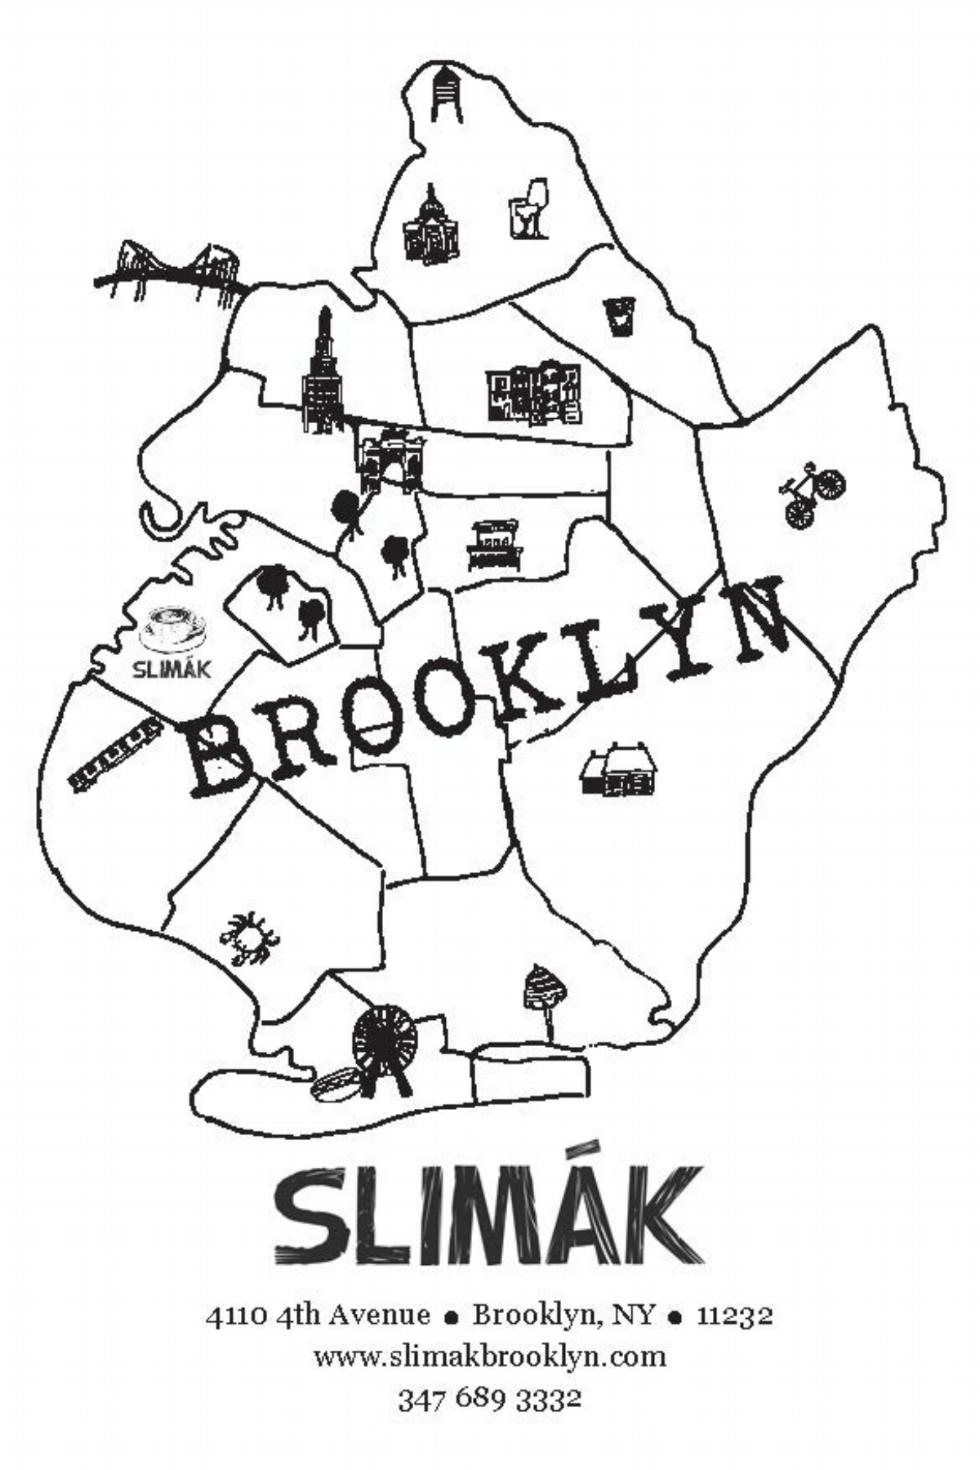 Slimak.map_Page_1.jpg